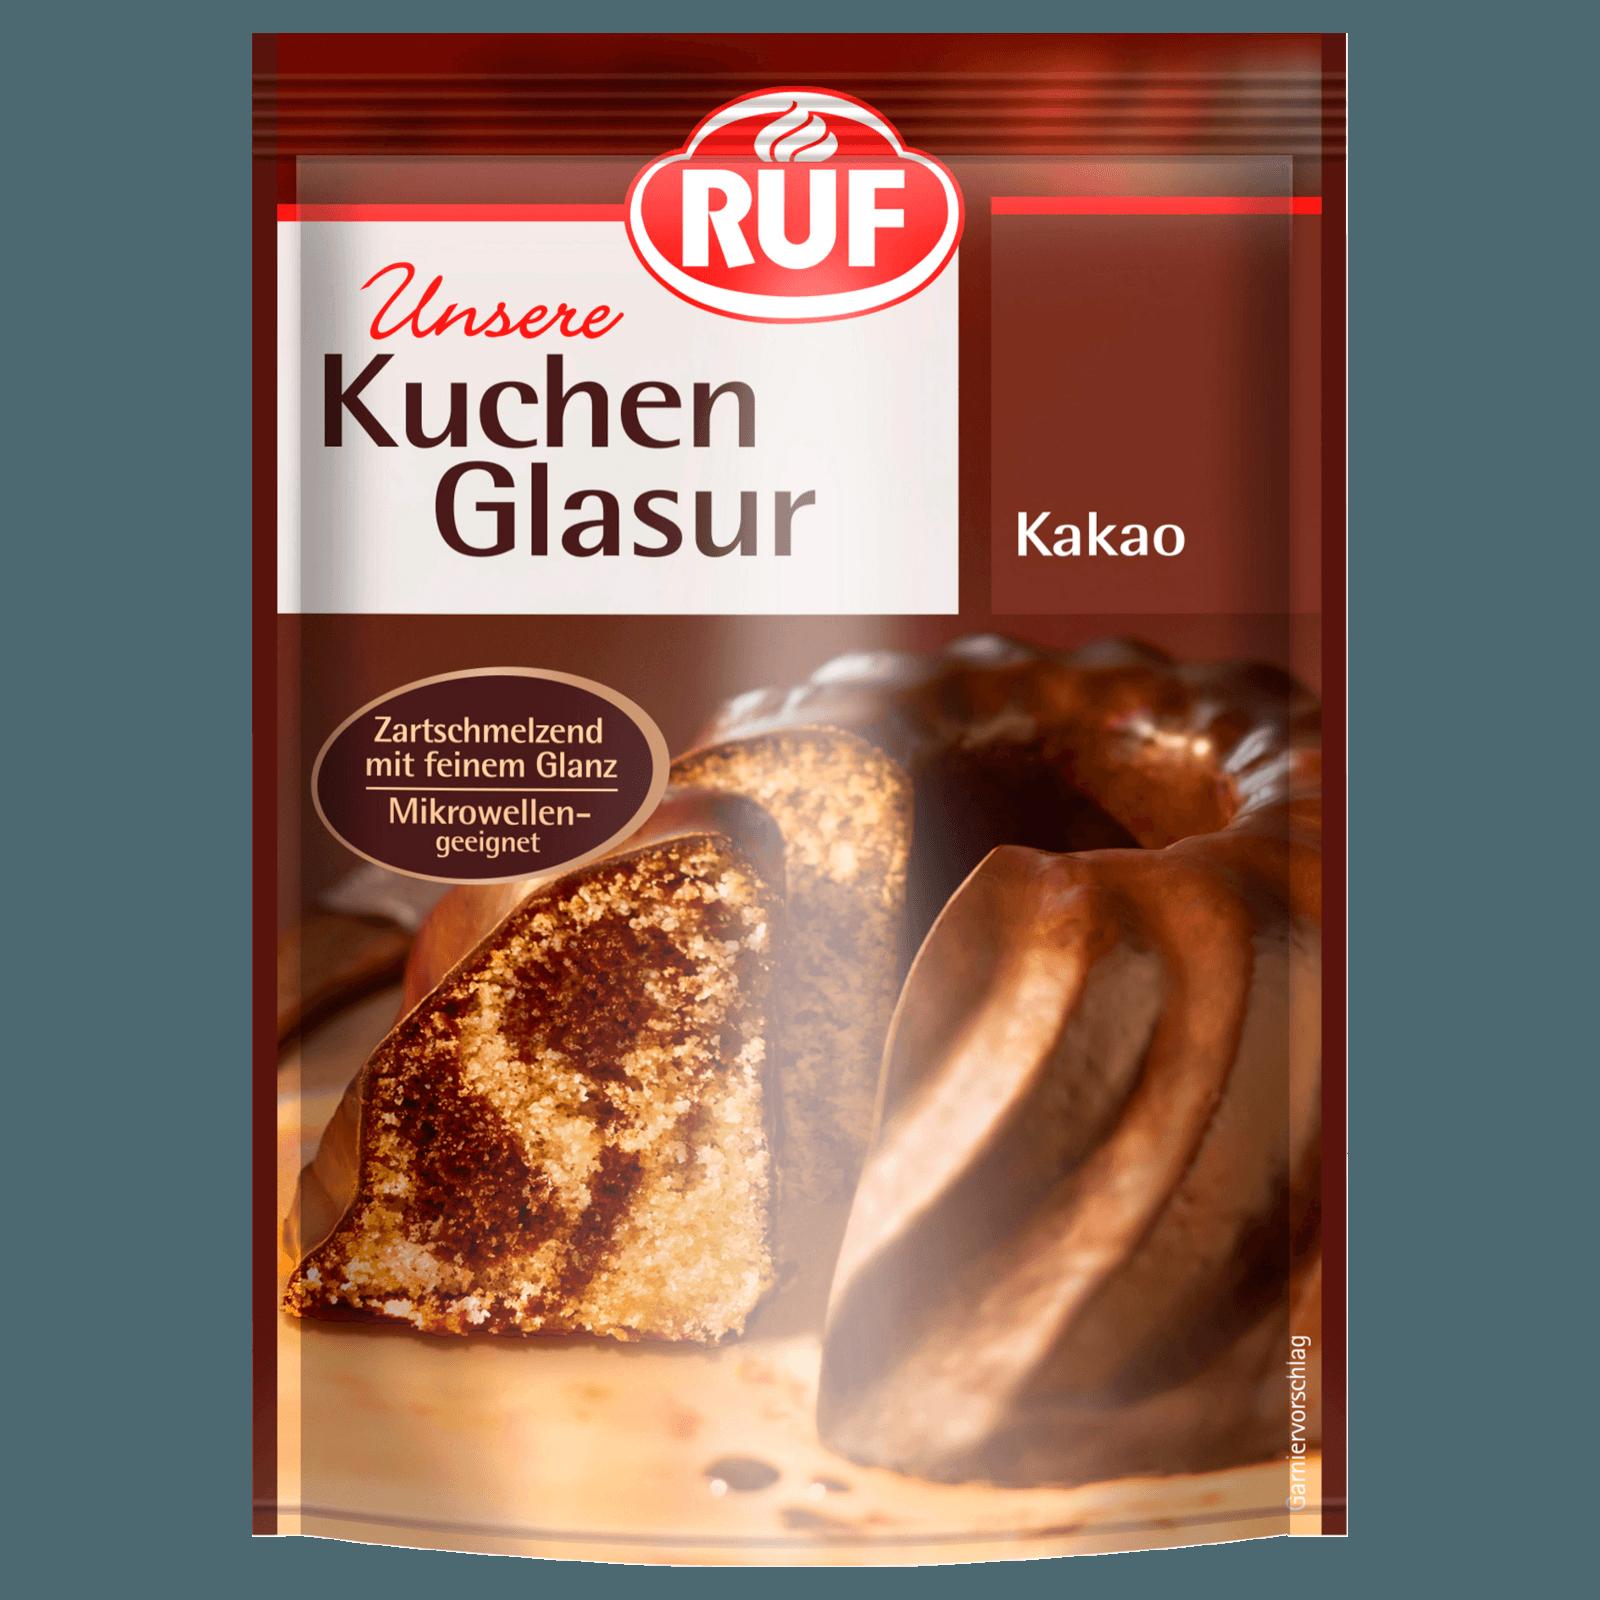 Ruf Kuchenglasur Kakao 100g Bei Rewe Online Bestellen